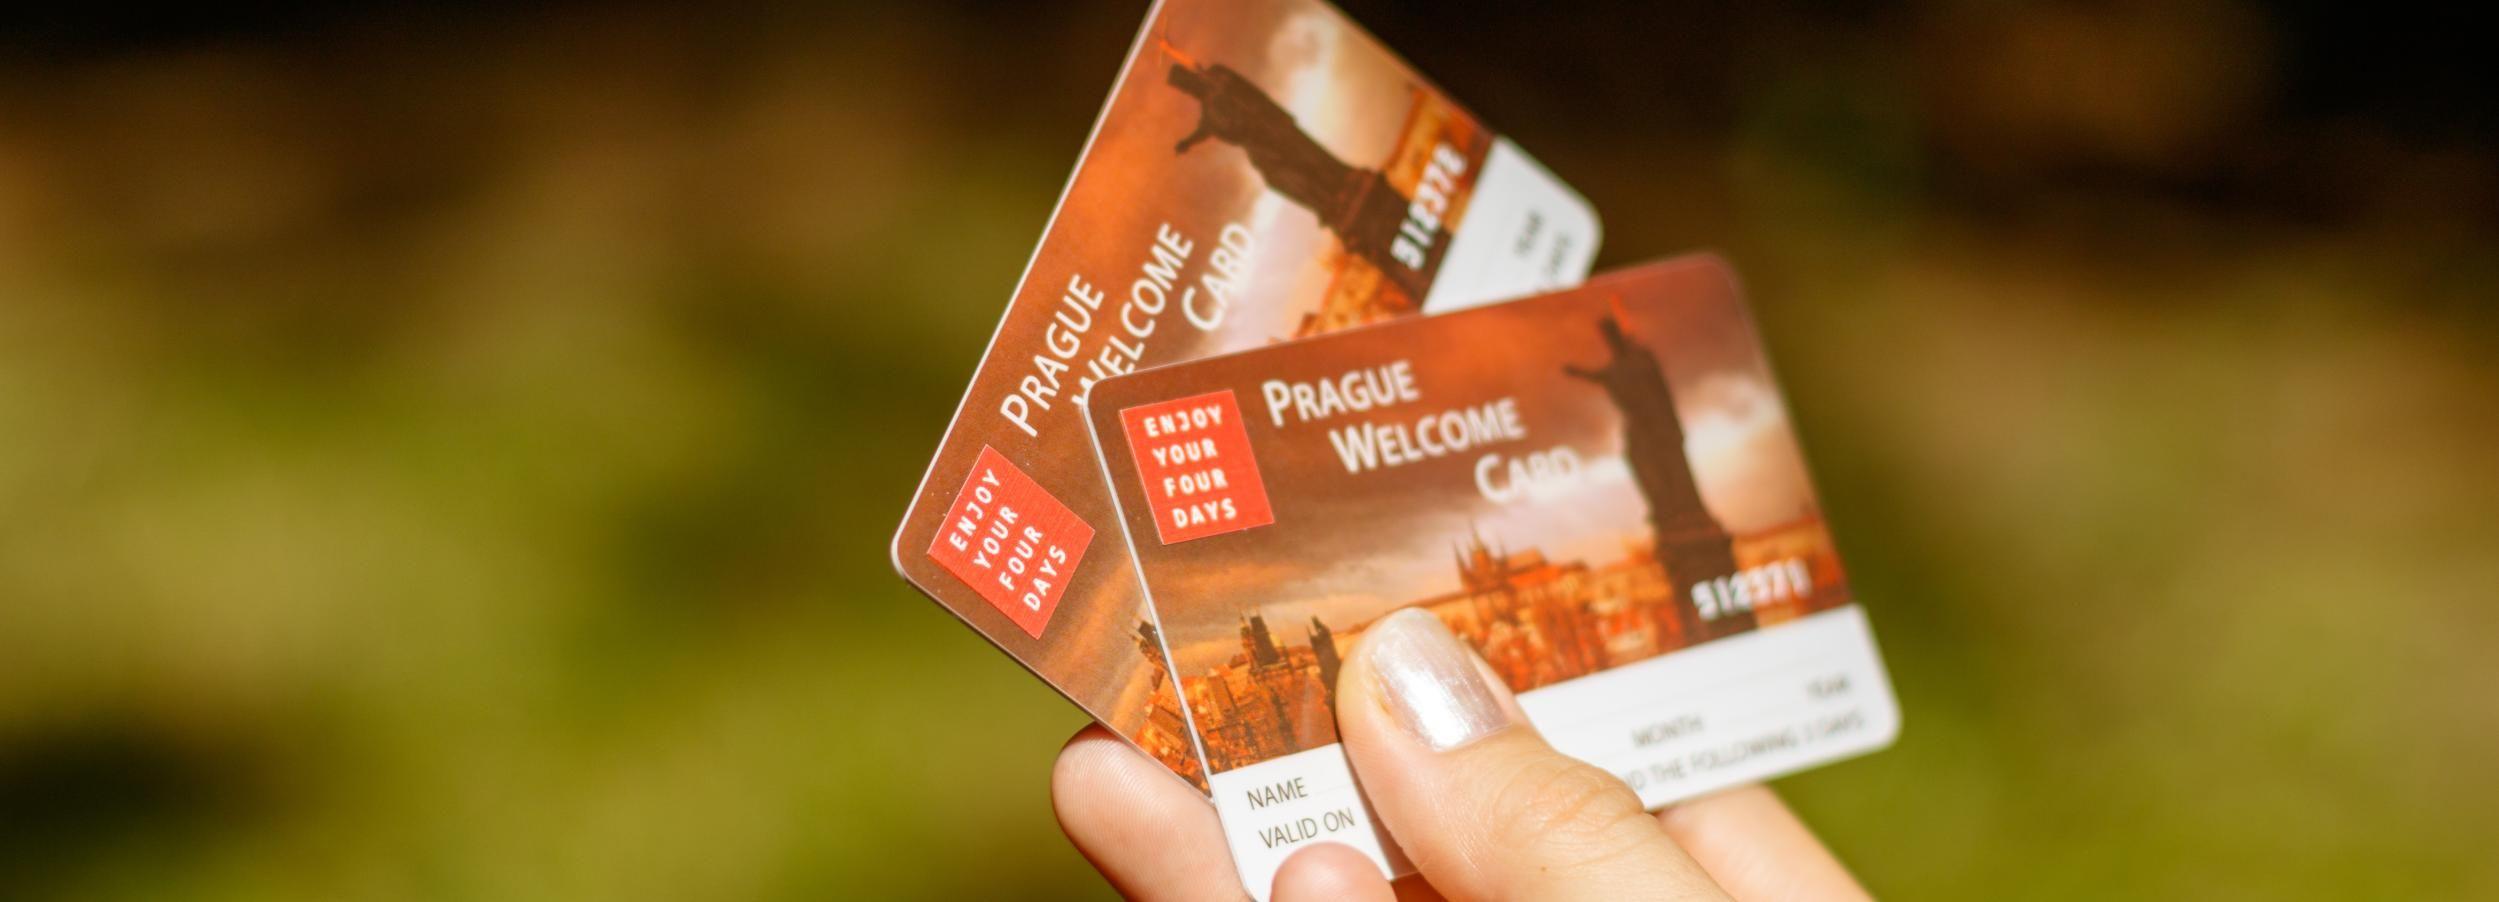 Praag Welcome Card